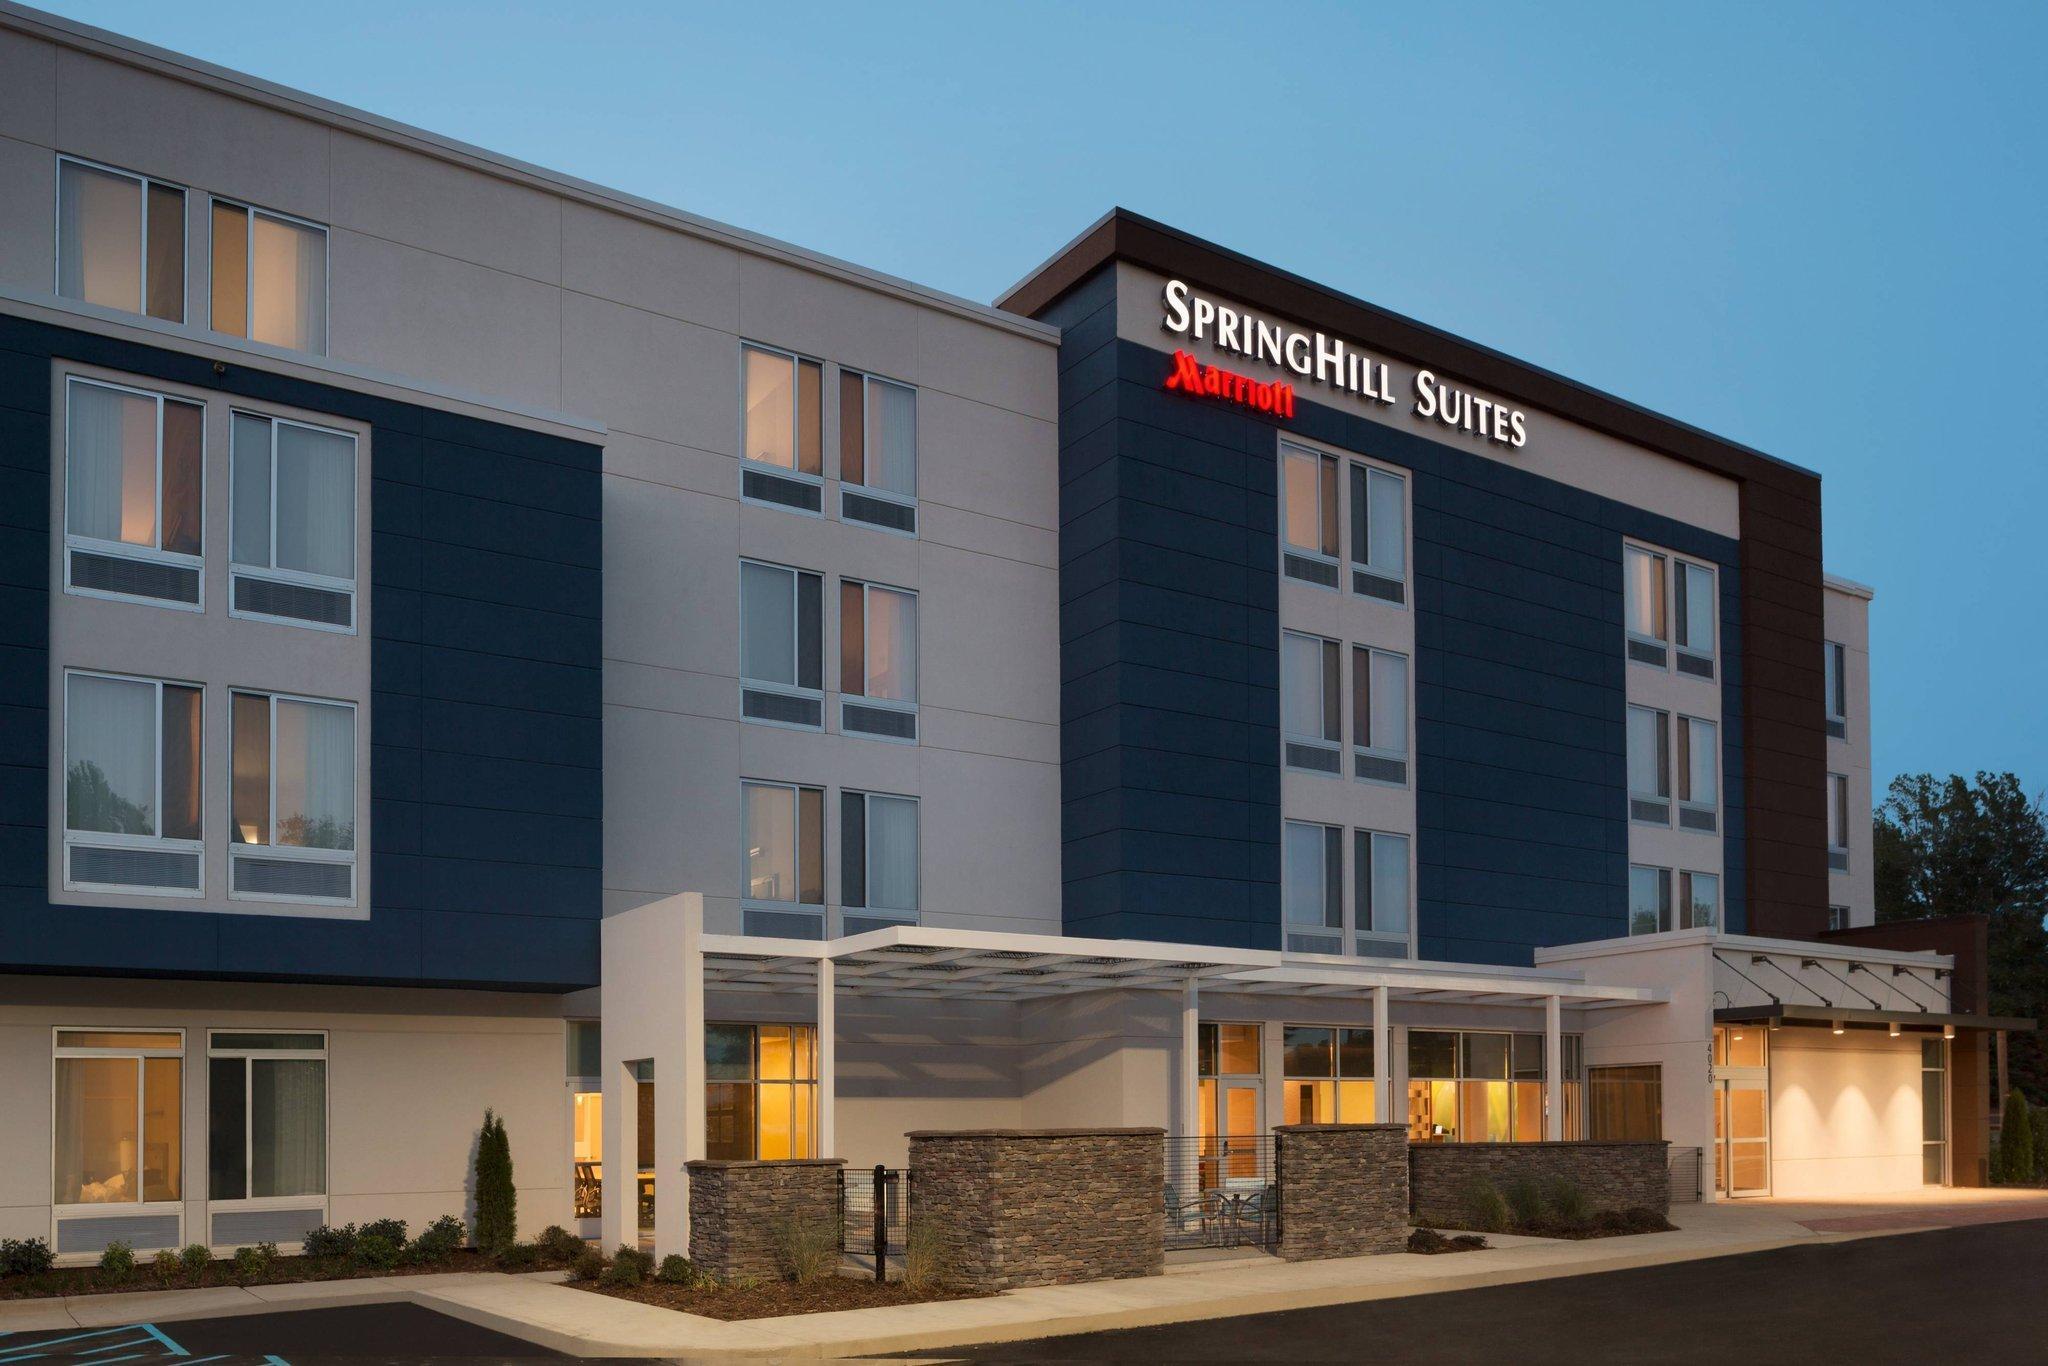 SpringHill Suites Tuscaloosa